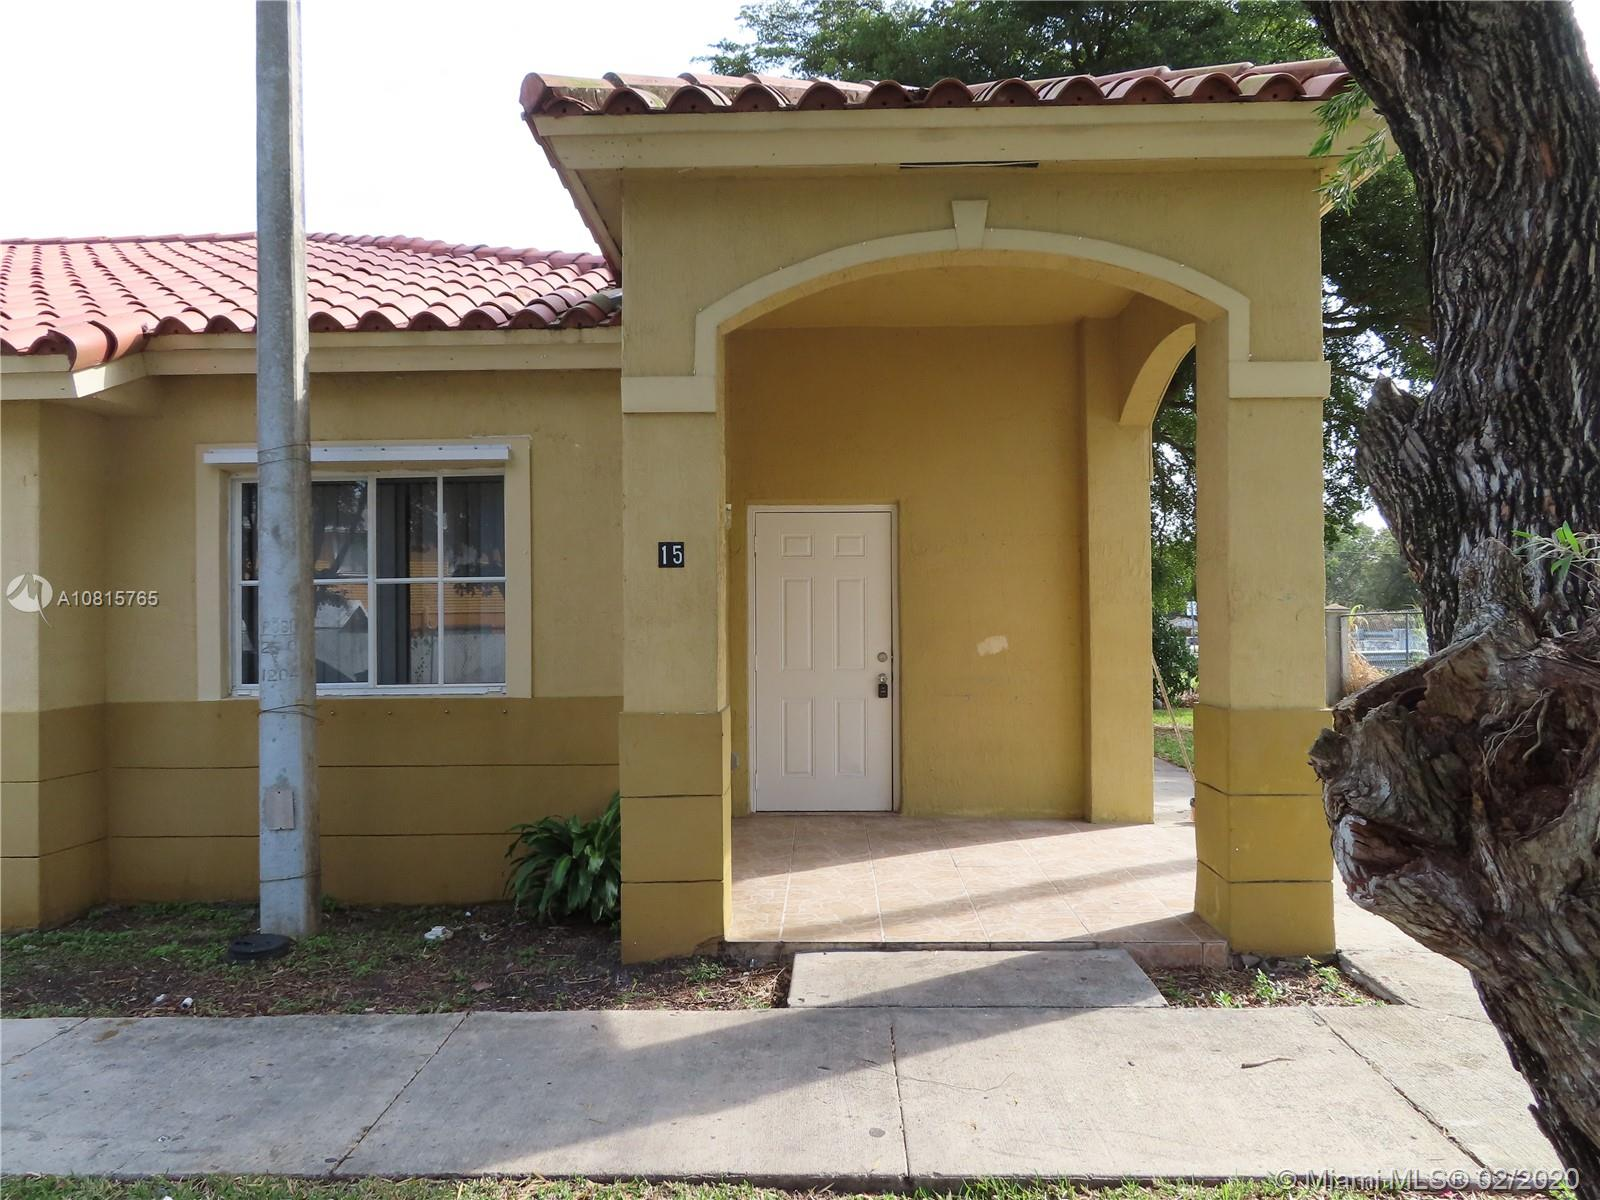 15 NE 13th Ave #1, Homestead, FL 33033 - Homestead, FL real estate listing